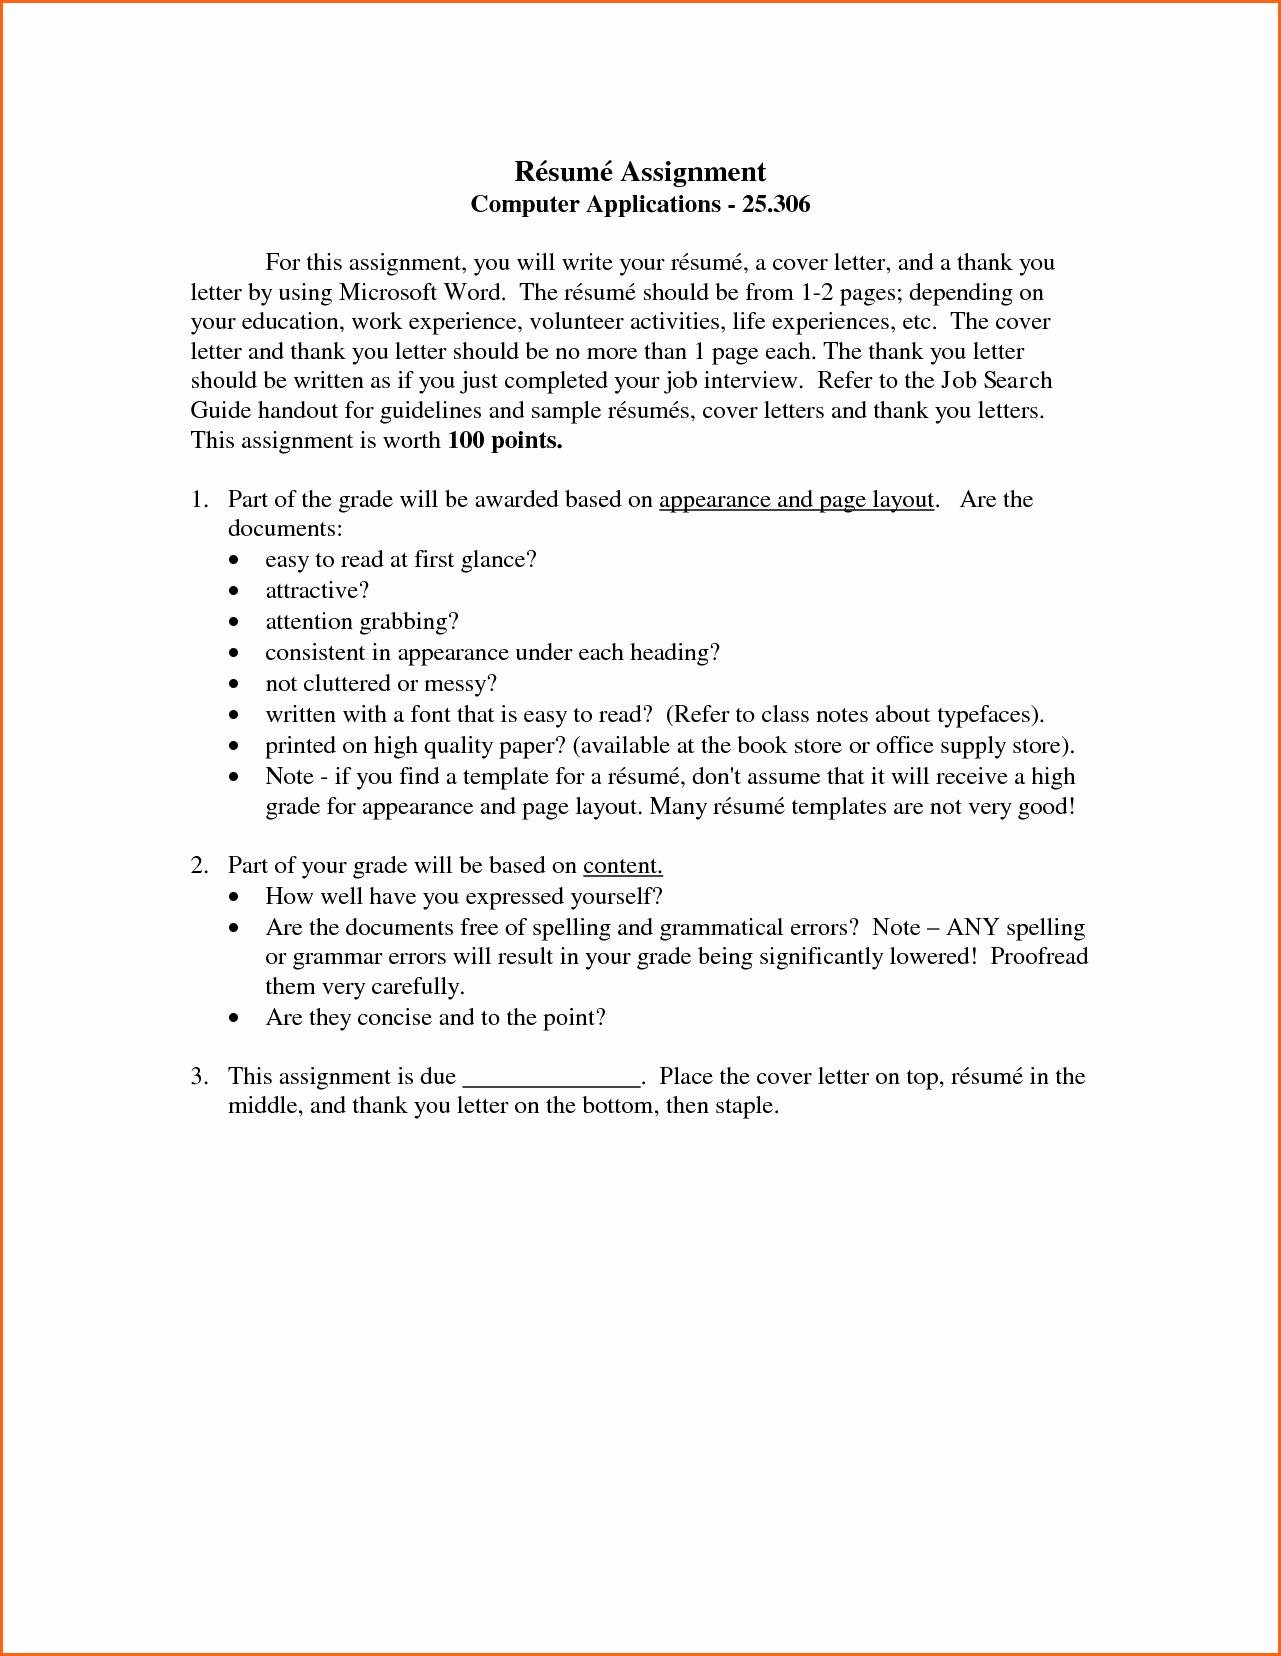 Resumes On Microsoft Word 2007 Best Of 6 Free Resume Templates Microsoft Word 2007 Bud